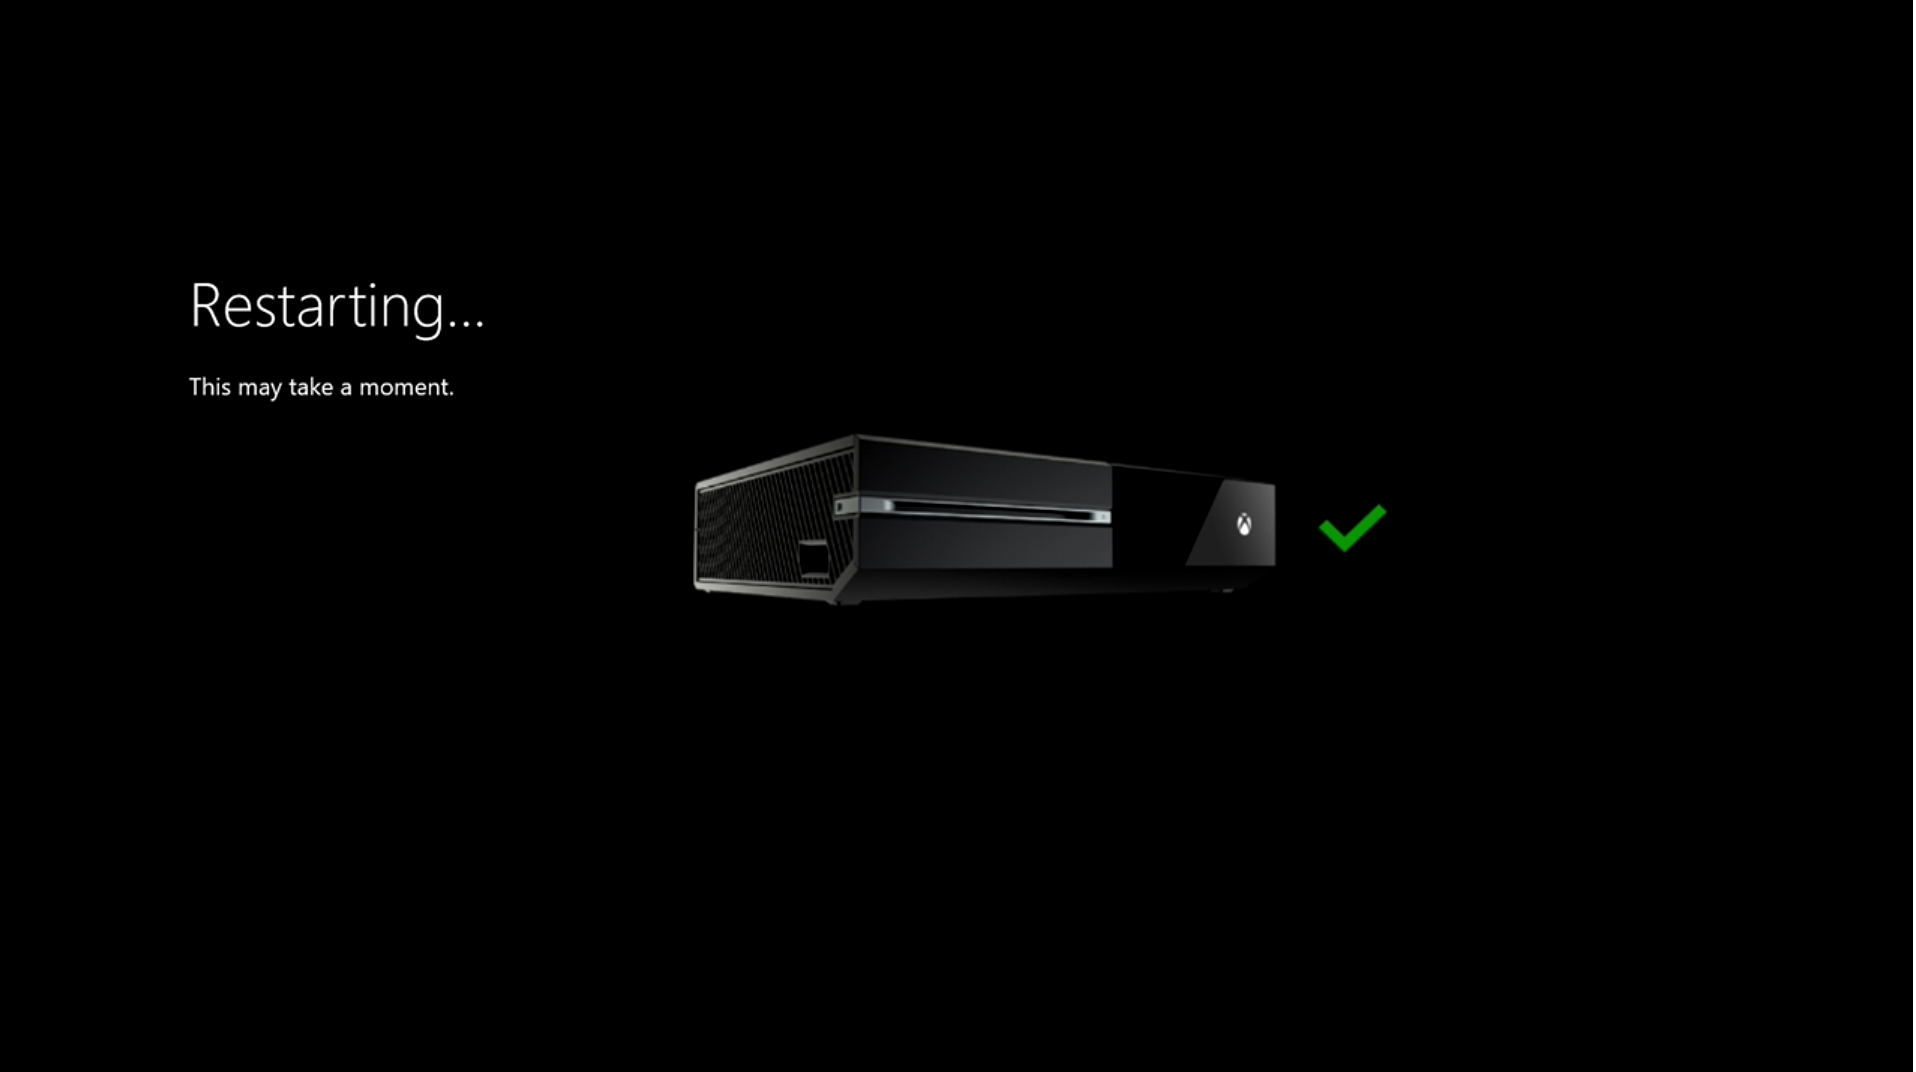 11 - Console Restarts